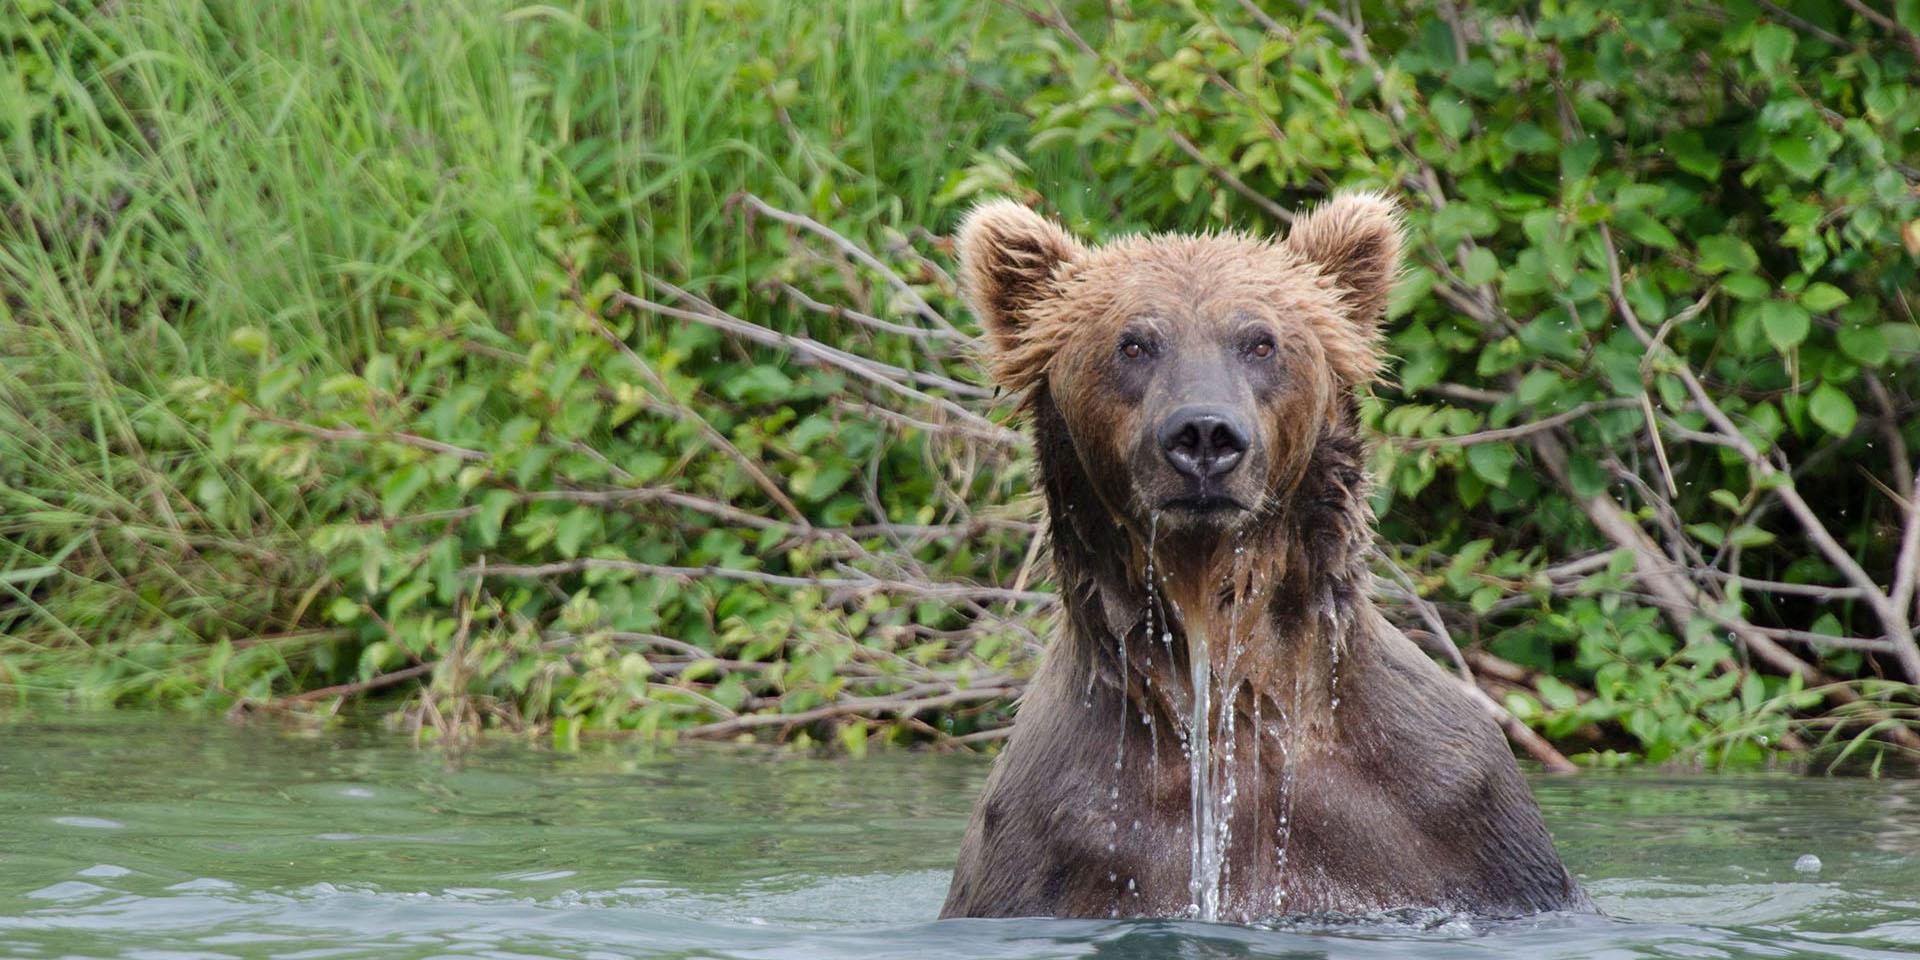 bear meme 04_2x1?1500581480 bear caption generator wild alaska live